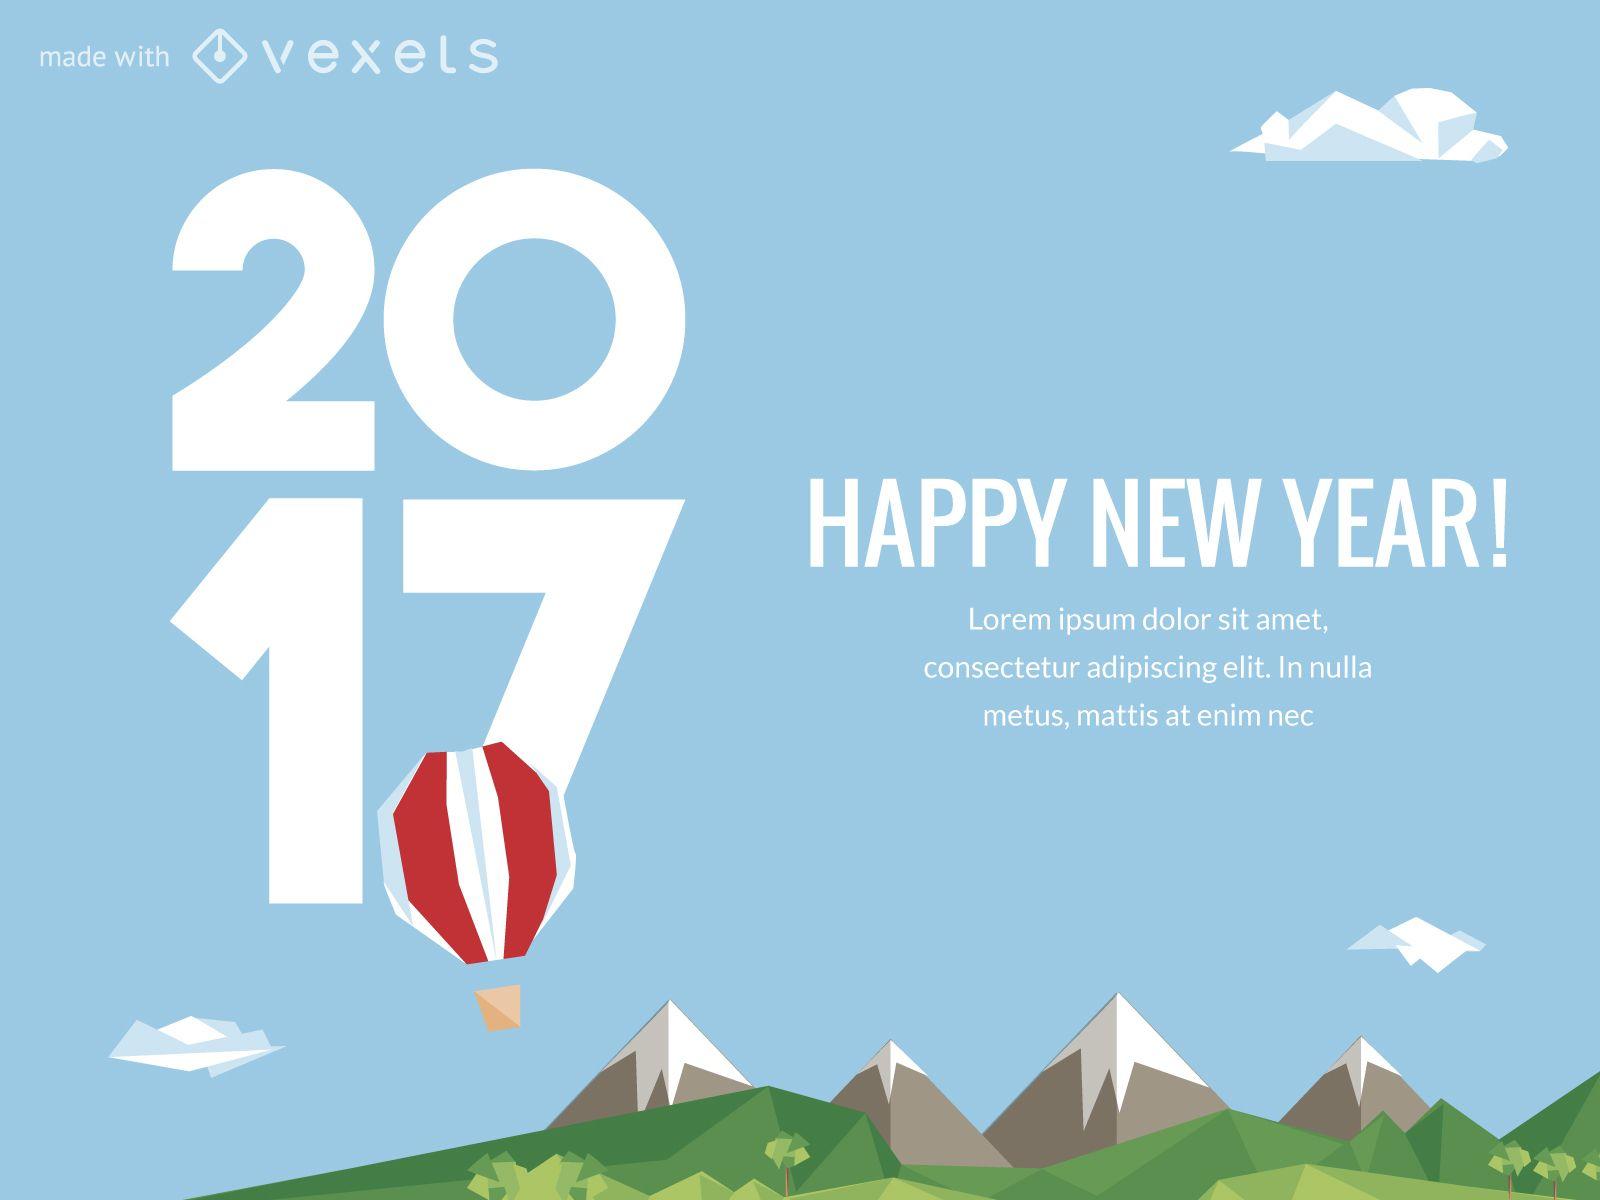 2017 New Year celebration poster maker